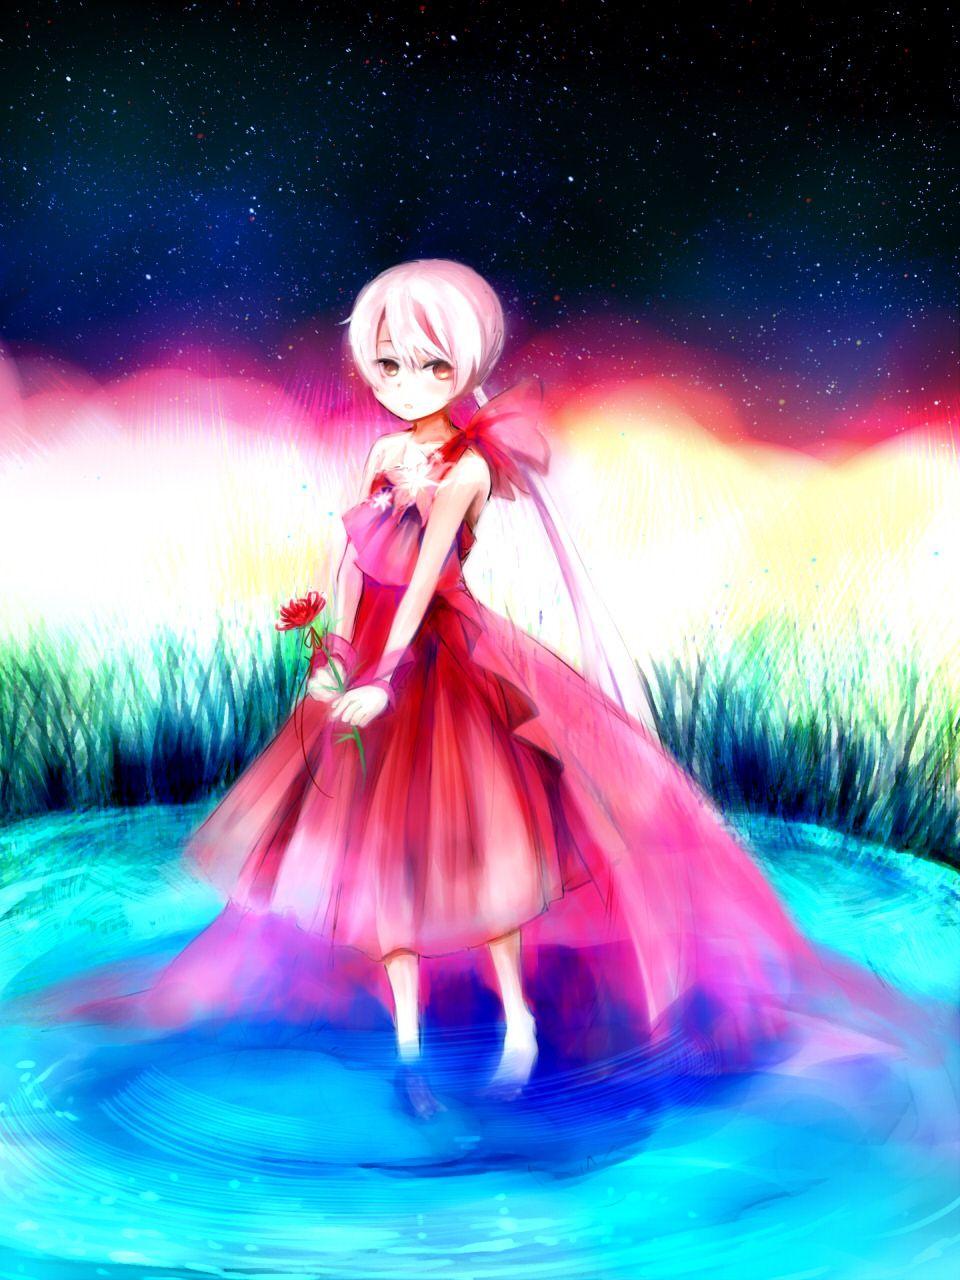 Pin by Stella G on IrohaNekomura Iroha, Vocaloid, Anime